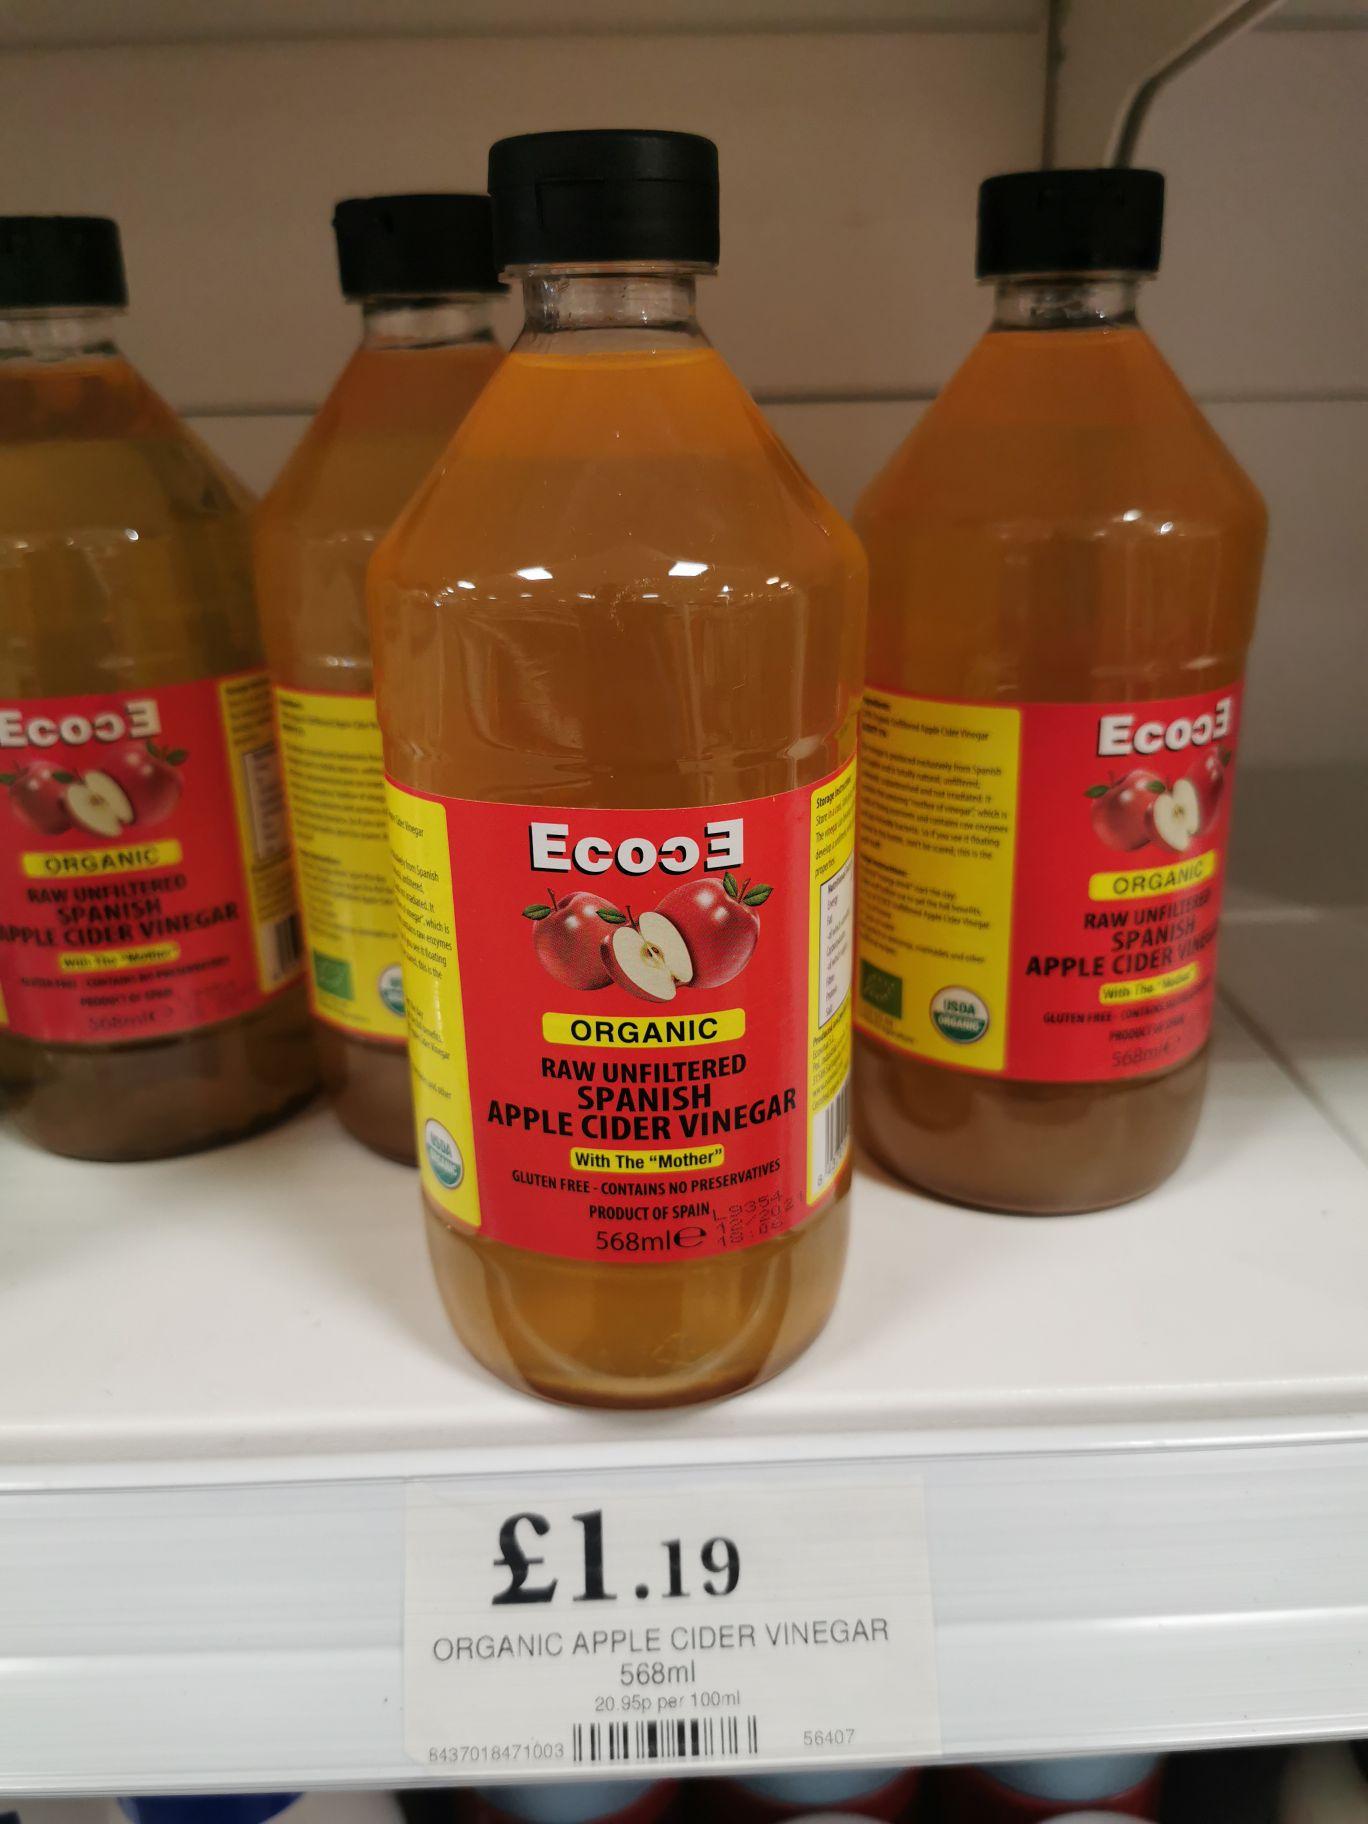 Organic Apple Cider Vinegar 568ml - £1.19 instore at Home Bargains (National)